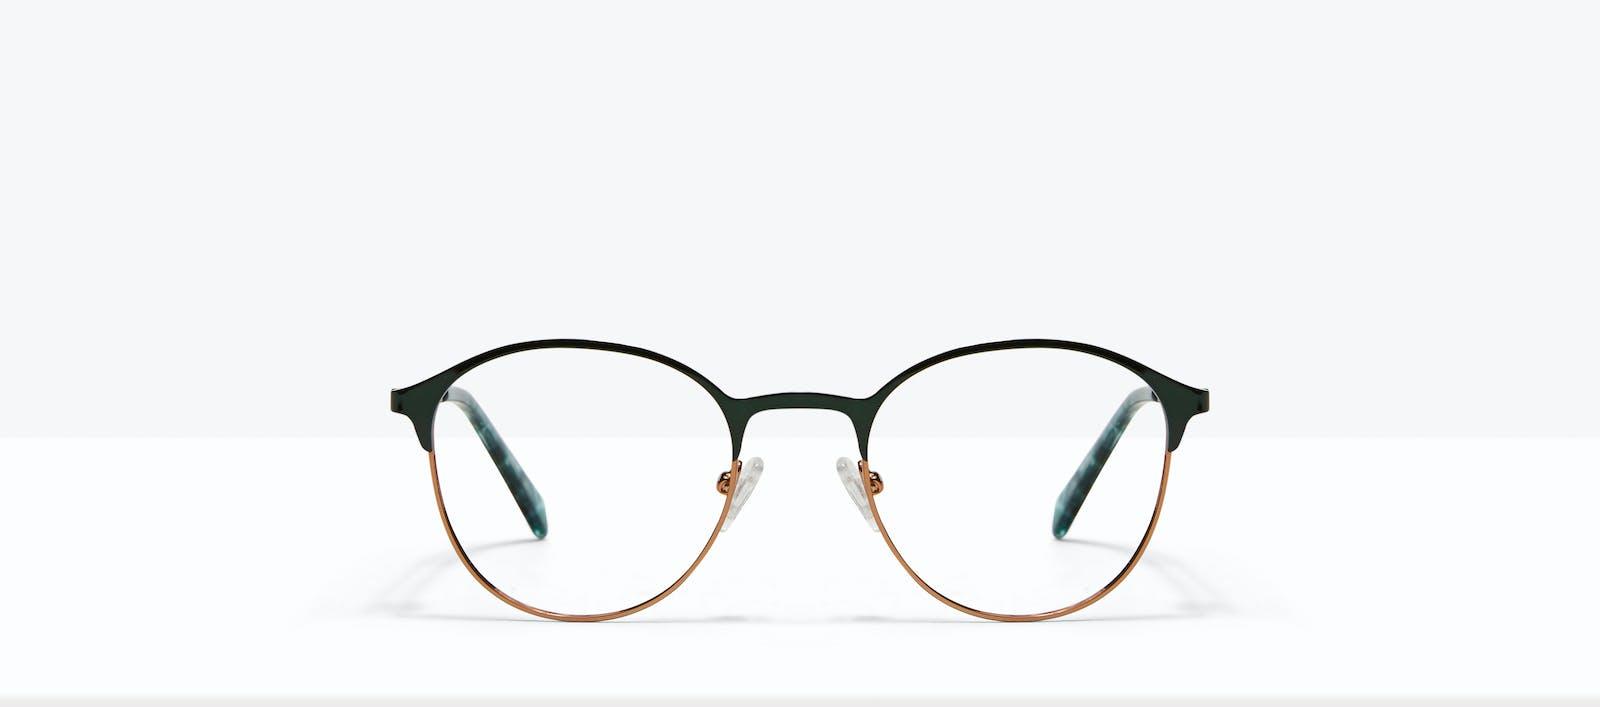 91af228e9b Affordable Fashion Glasses Round Eyeglasses Women Bay II Emeraude Front